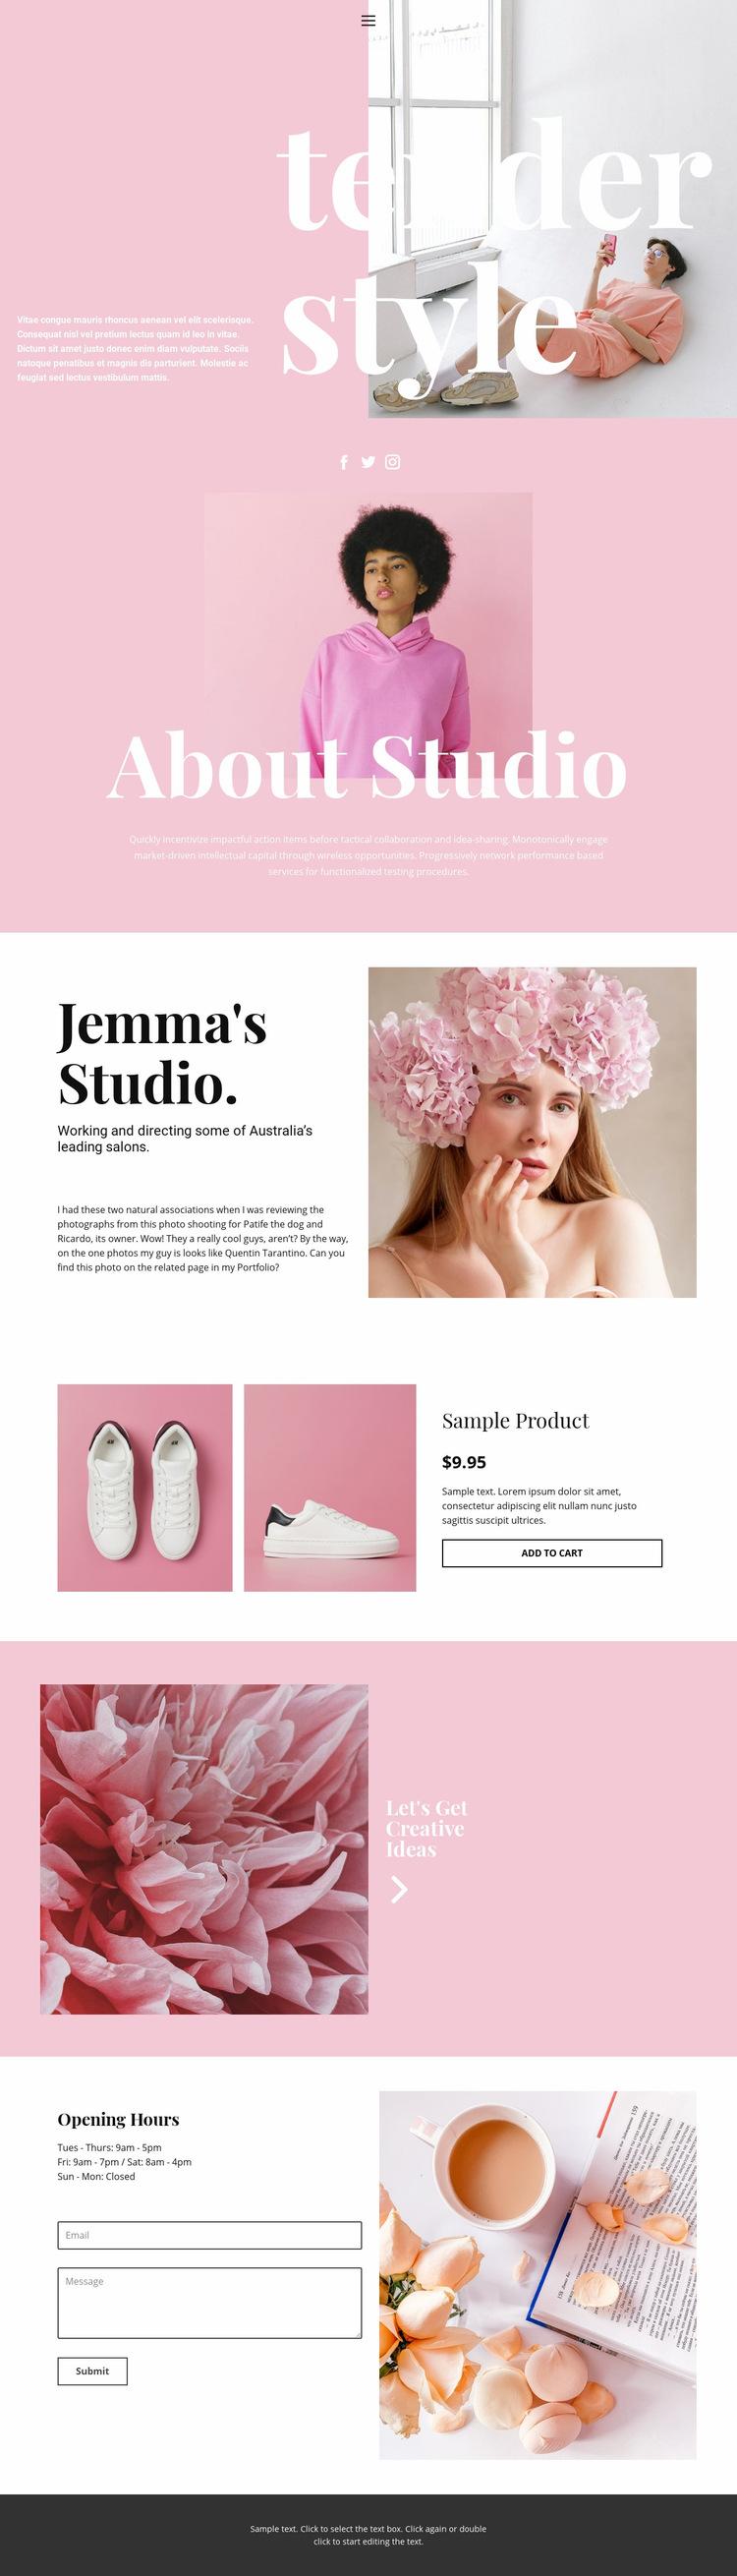 Fashion news Web Page Design